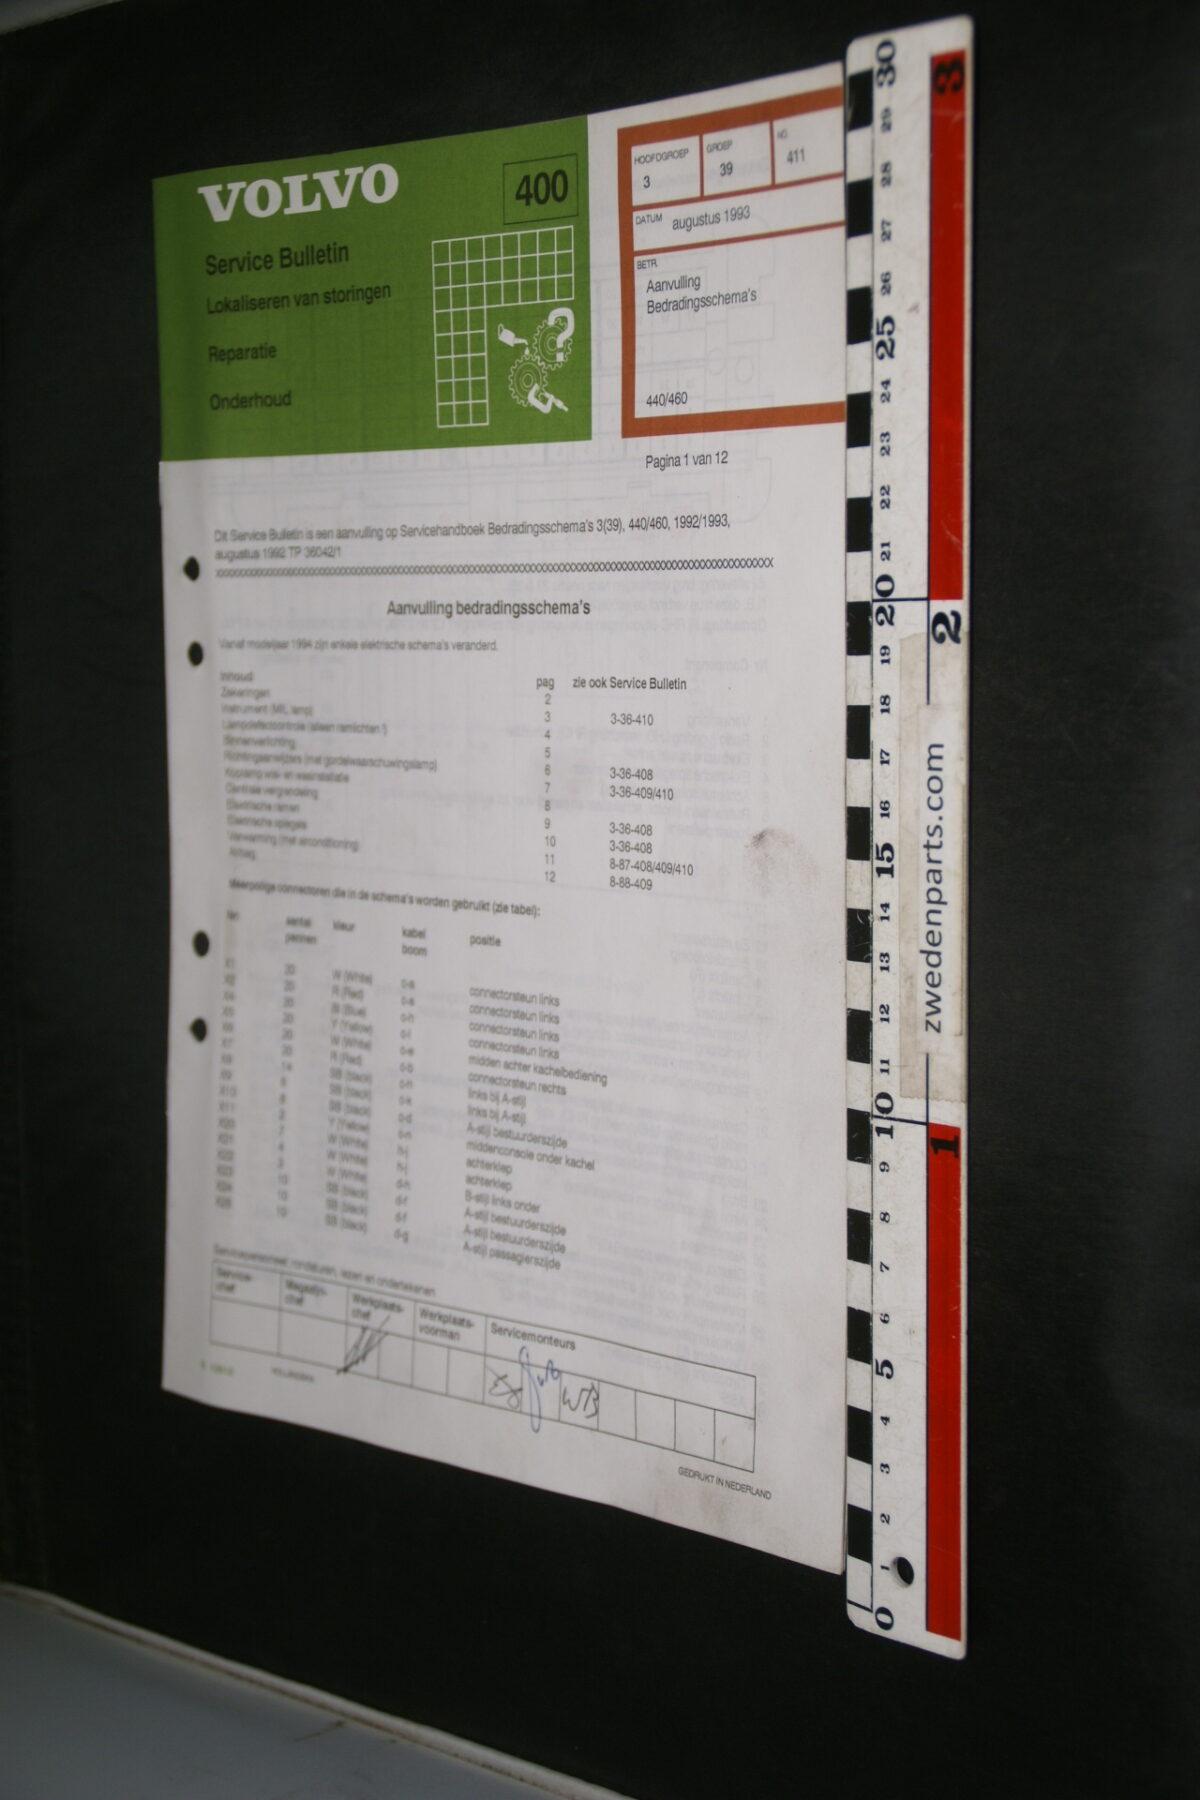 DSC08877 1986 origineel Volvo 440, 460 servicebulletin 3 (39) bedradingsschema B10918